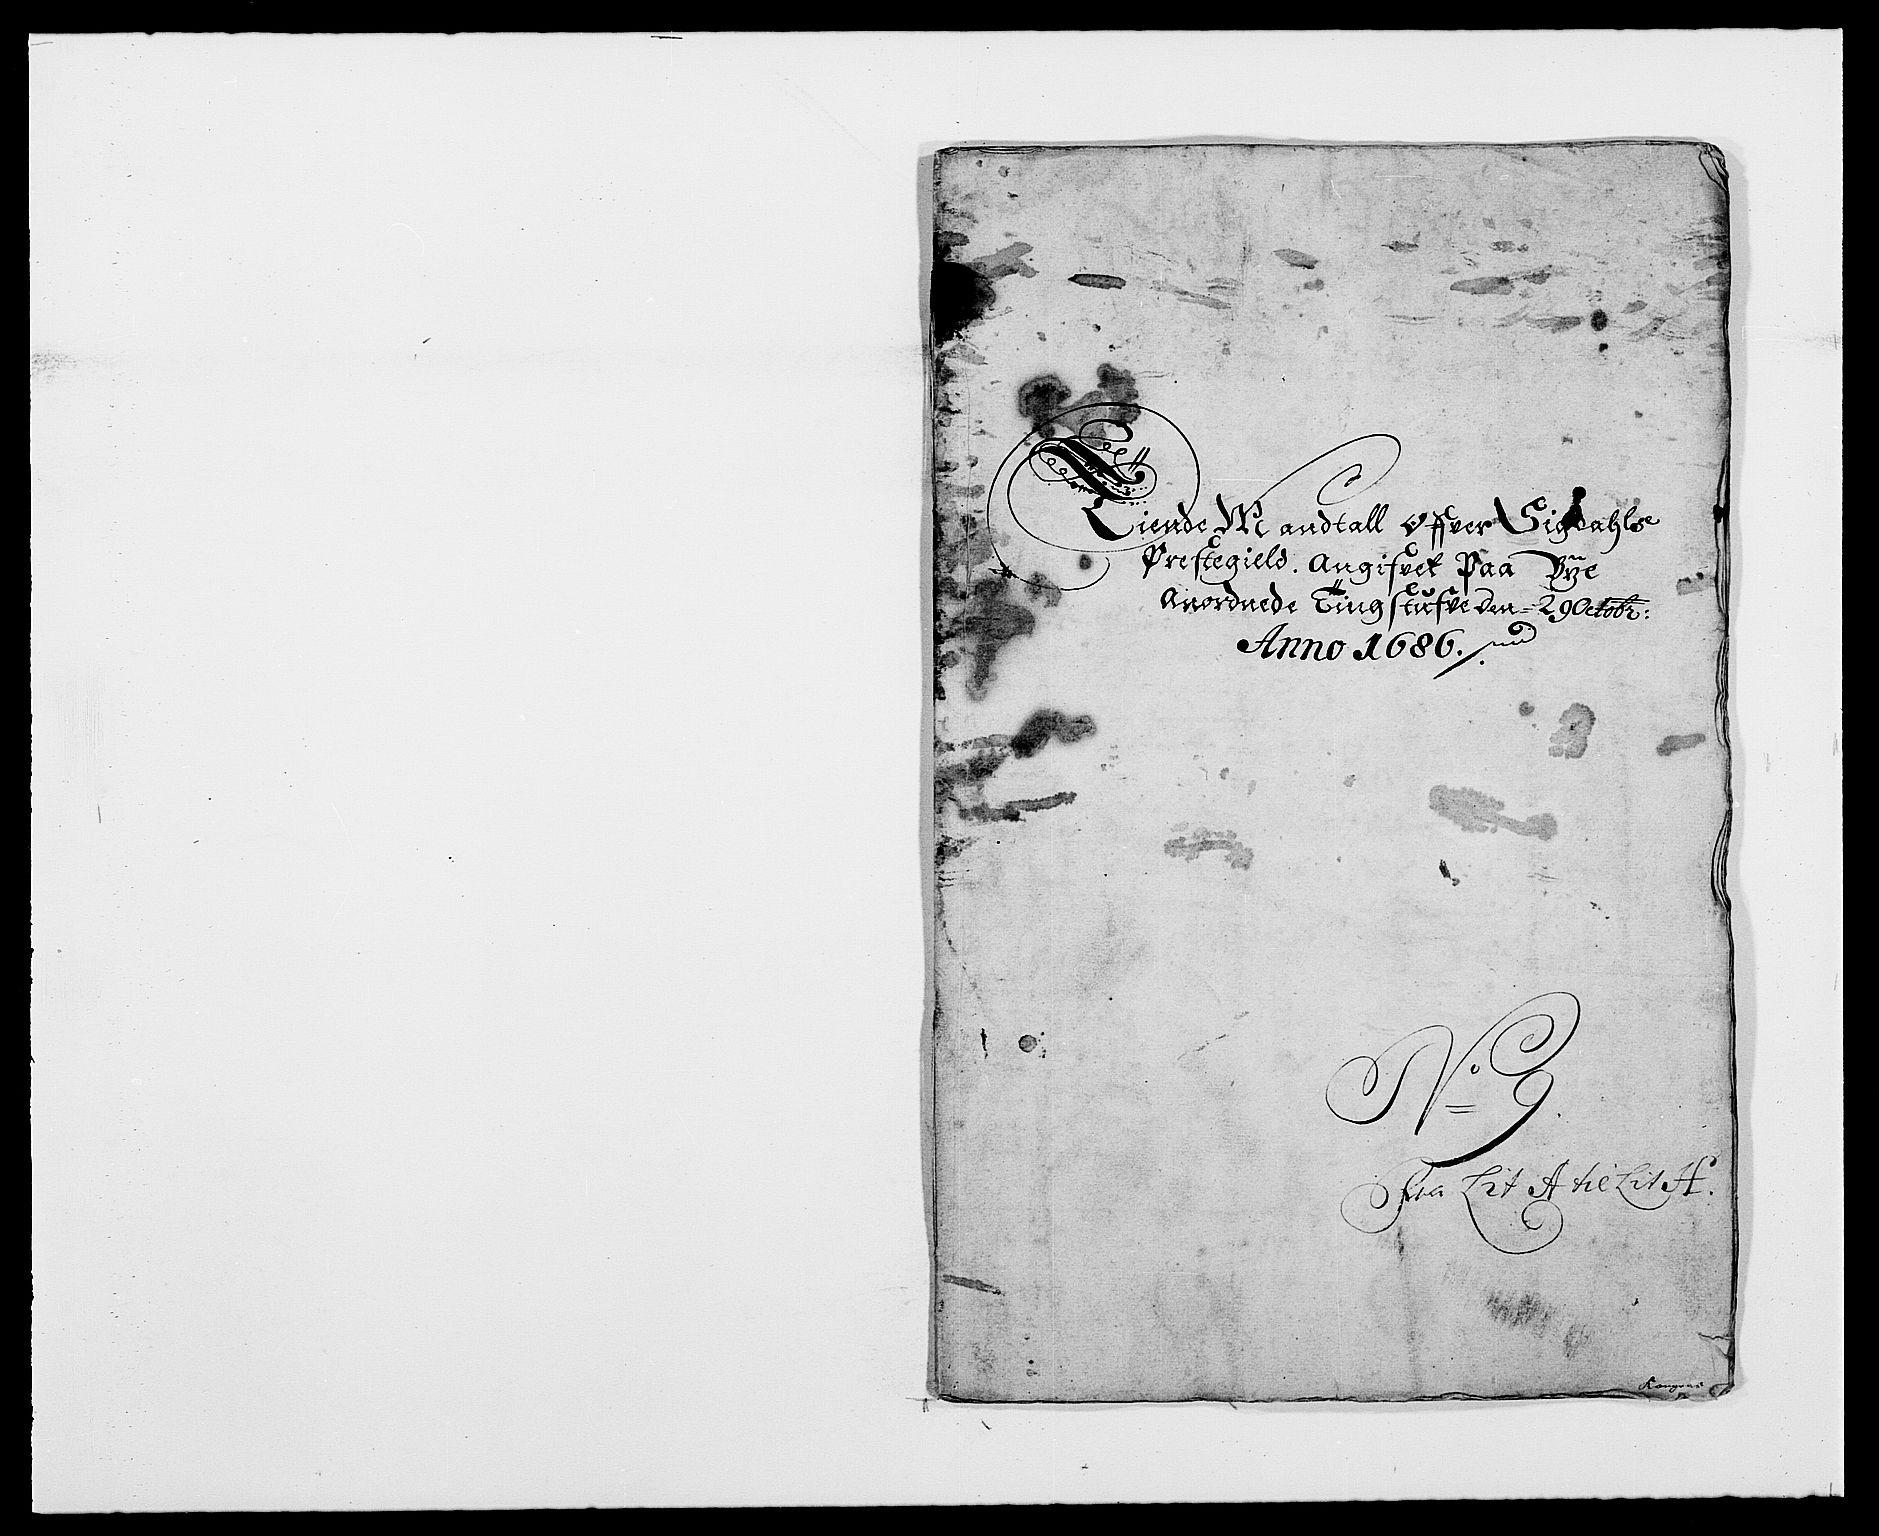 RA, Rentekammeret inntil 1814, Reviderte regnskaper, Fogderegnskap, R25/L1678: Fogderegnskap Buskerud, 1685-1686, s. 372